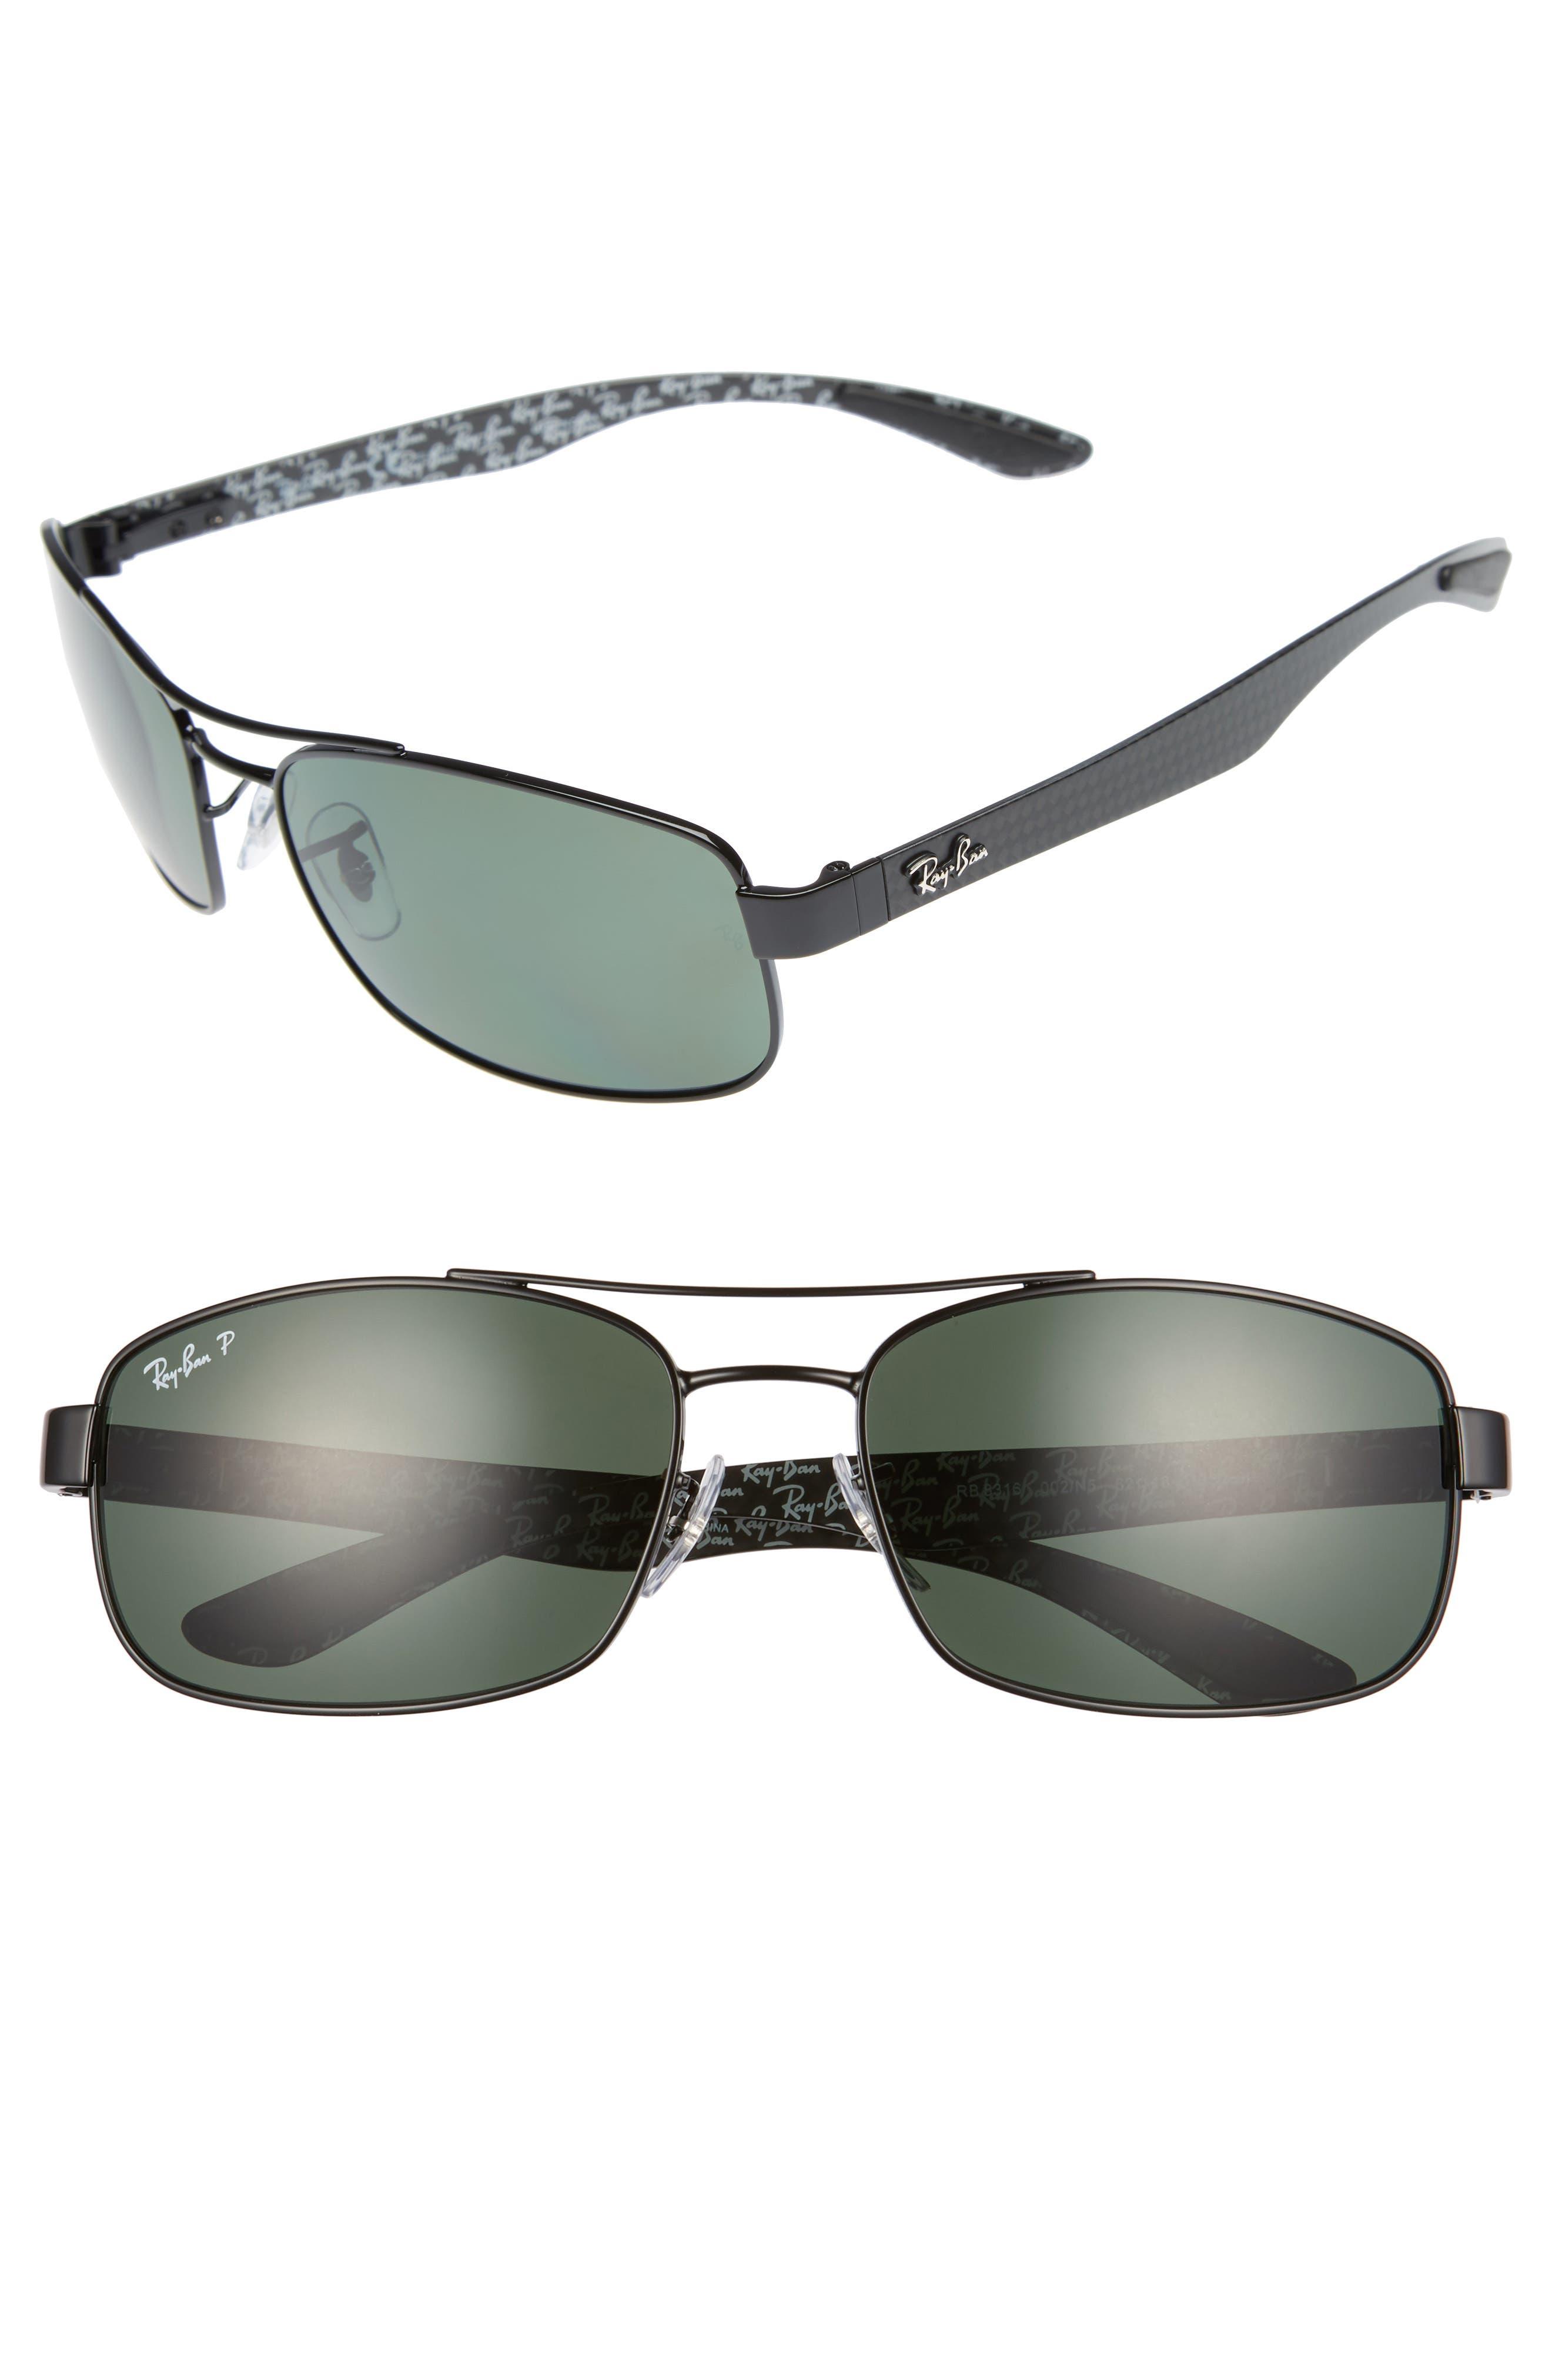 Main Image - Ray-Ban 62mm Polarized Sunglasses